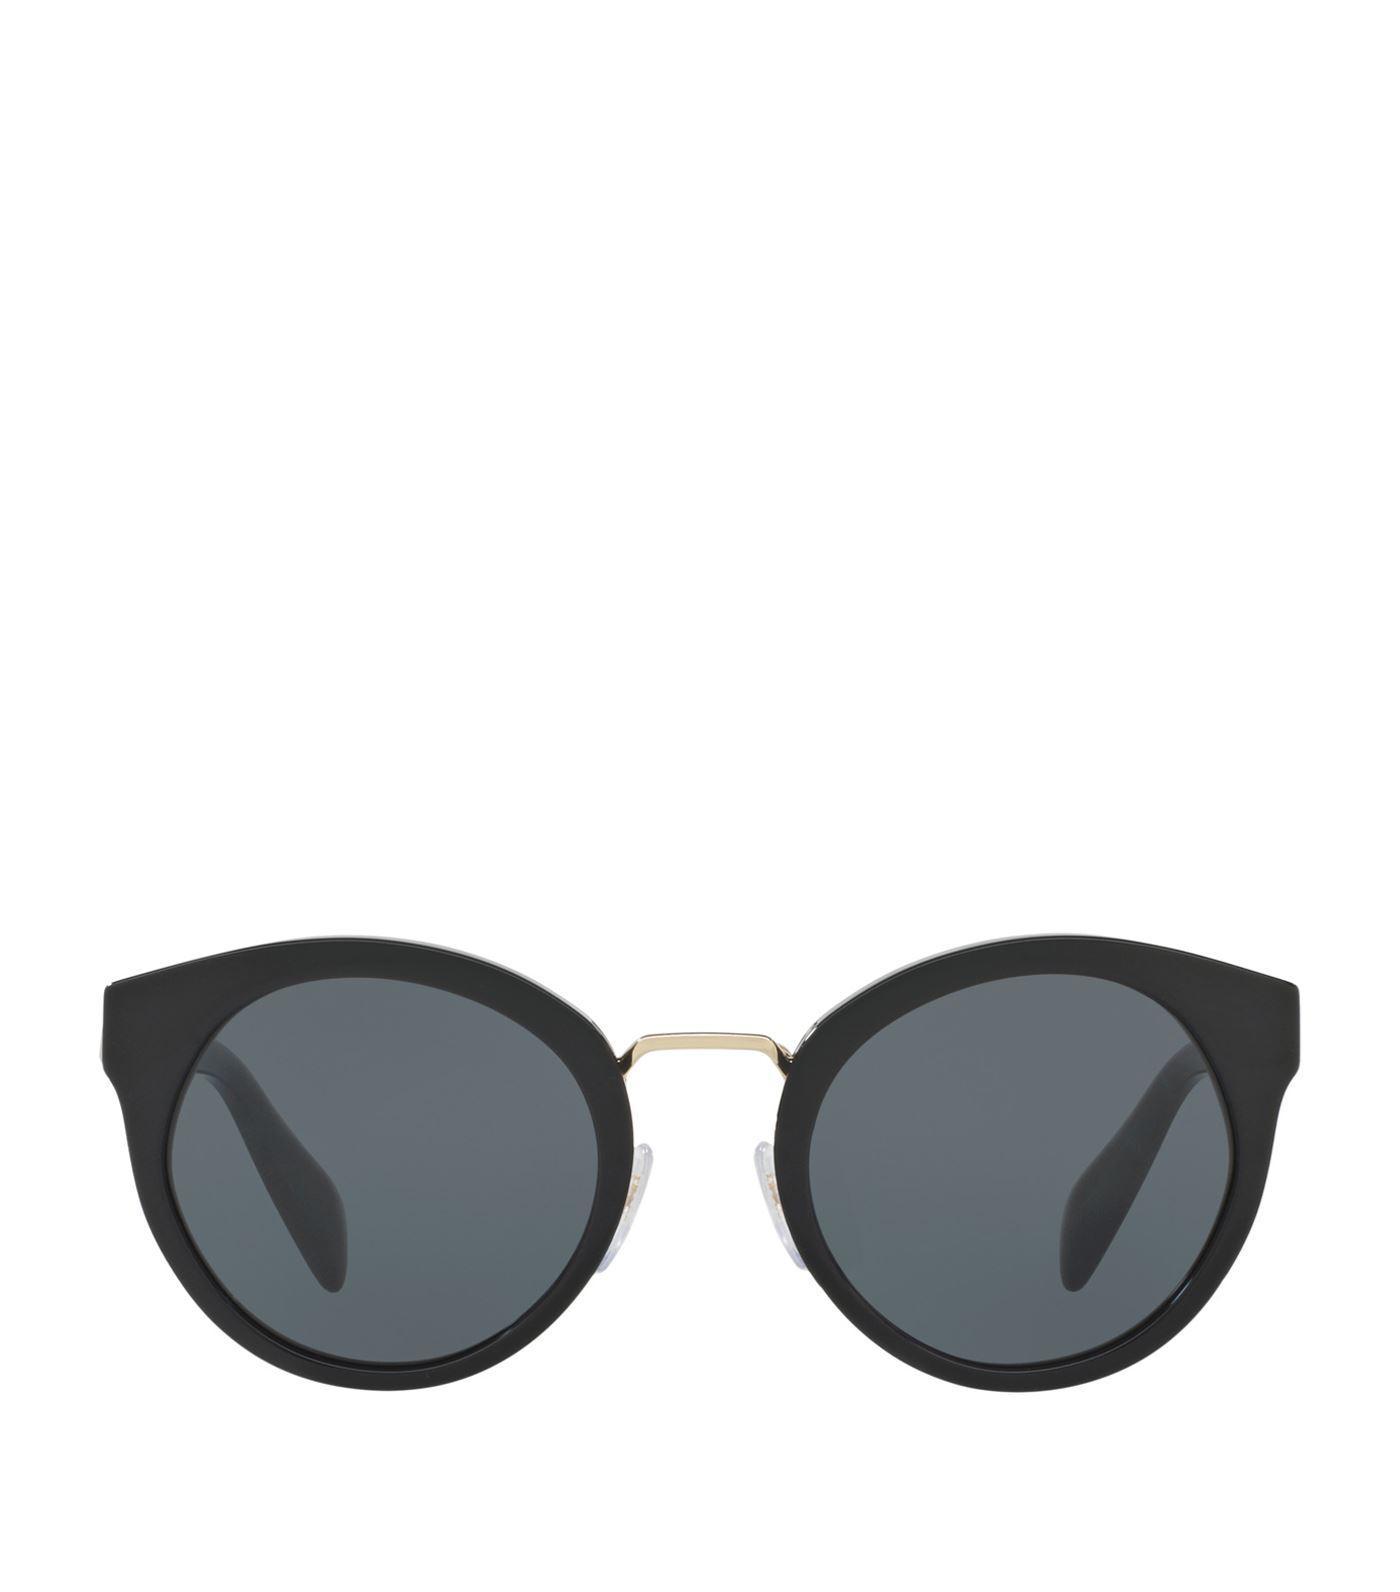 Prada Cat-eye Acetate Sunglasses In Black